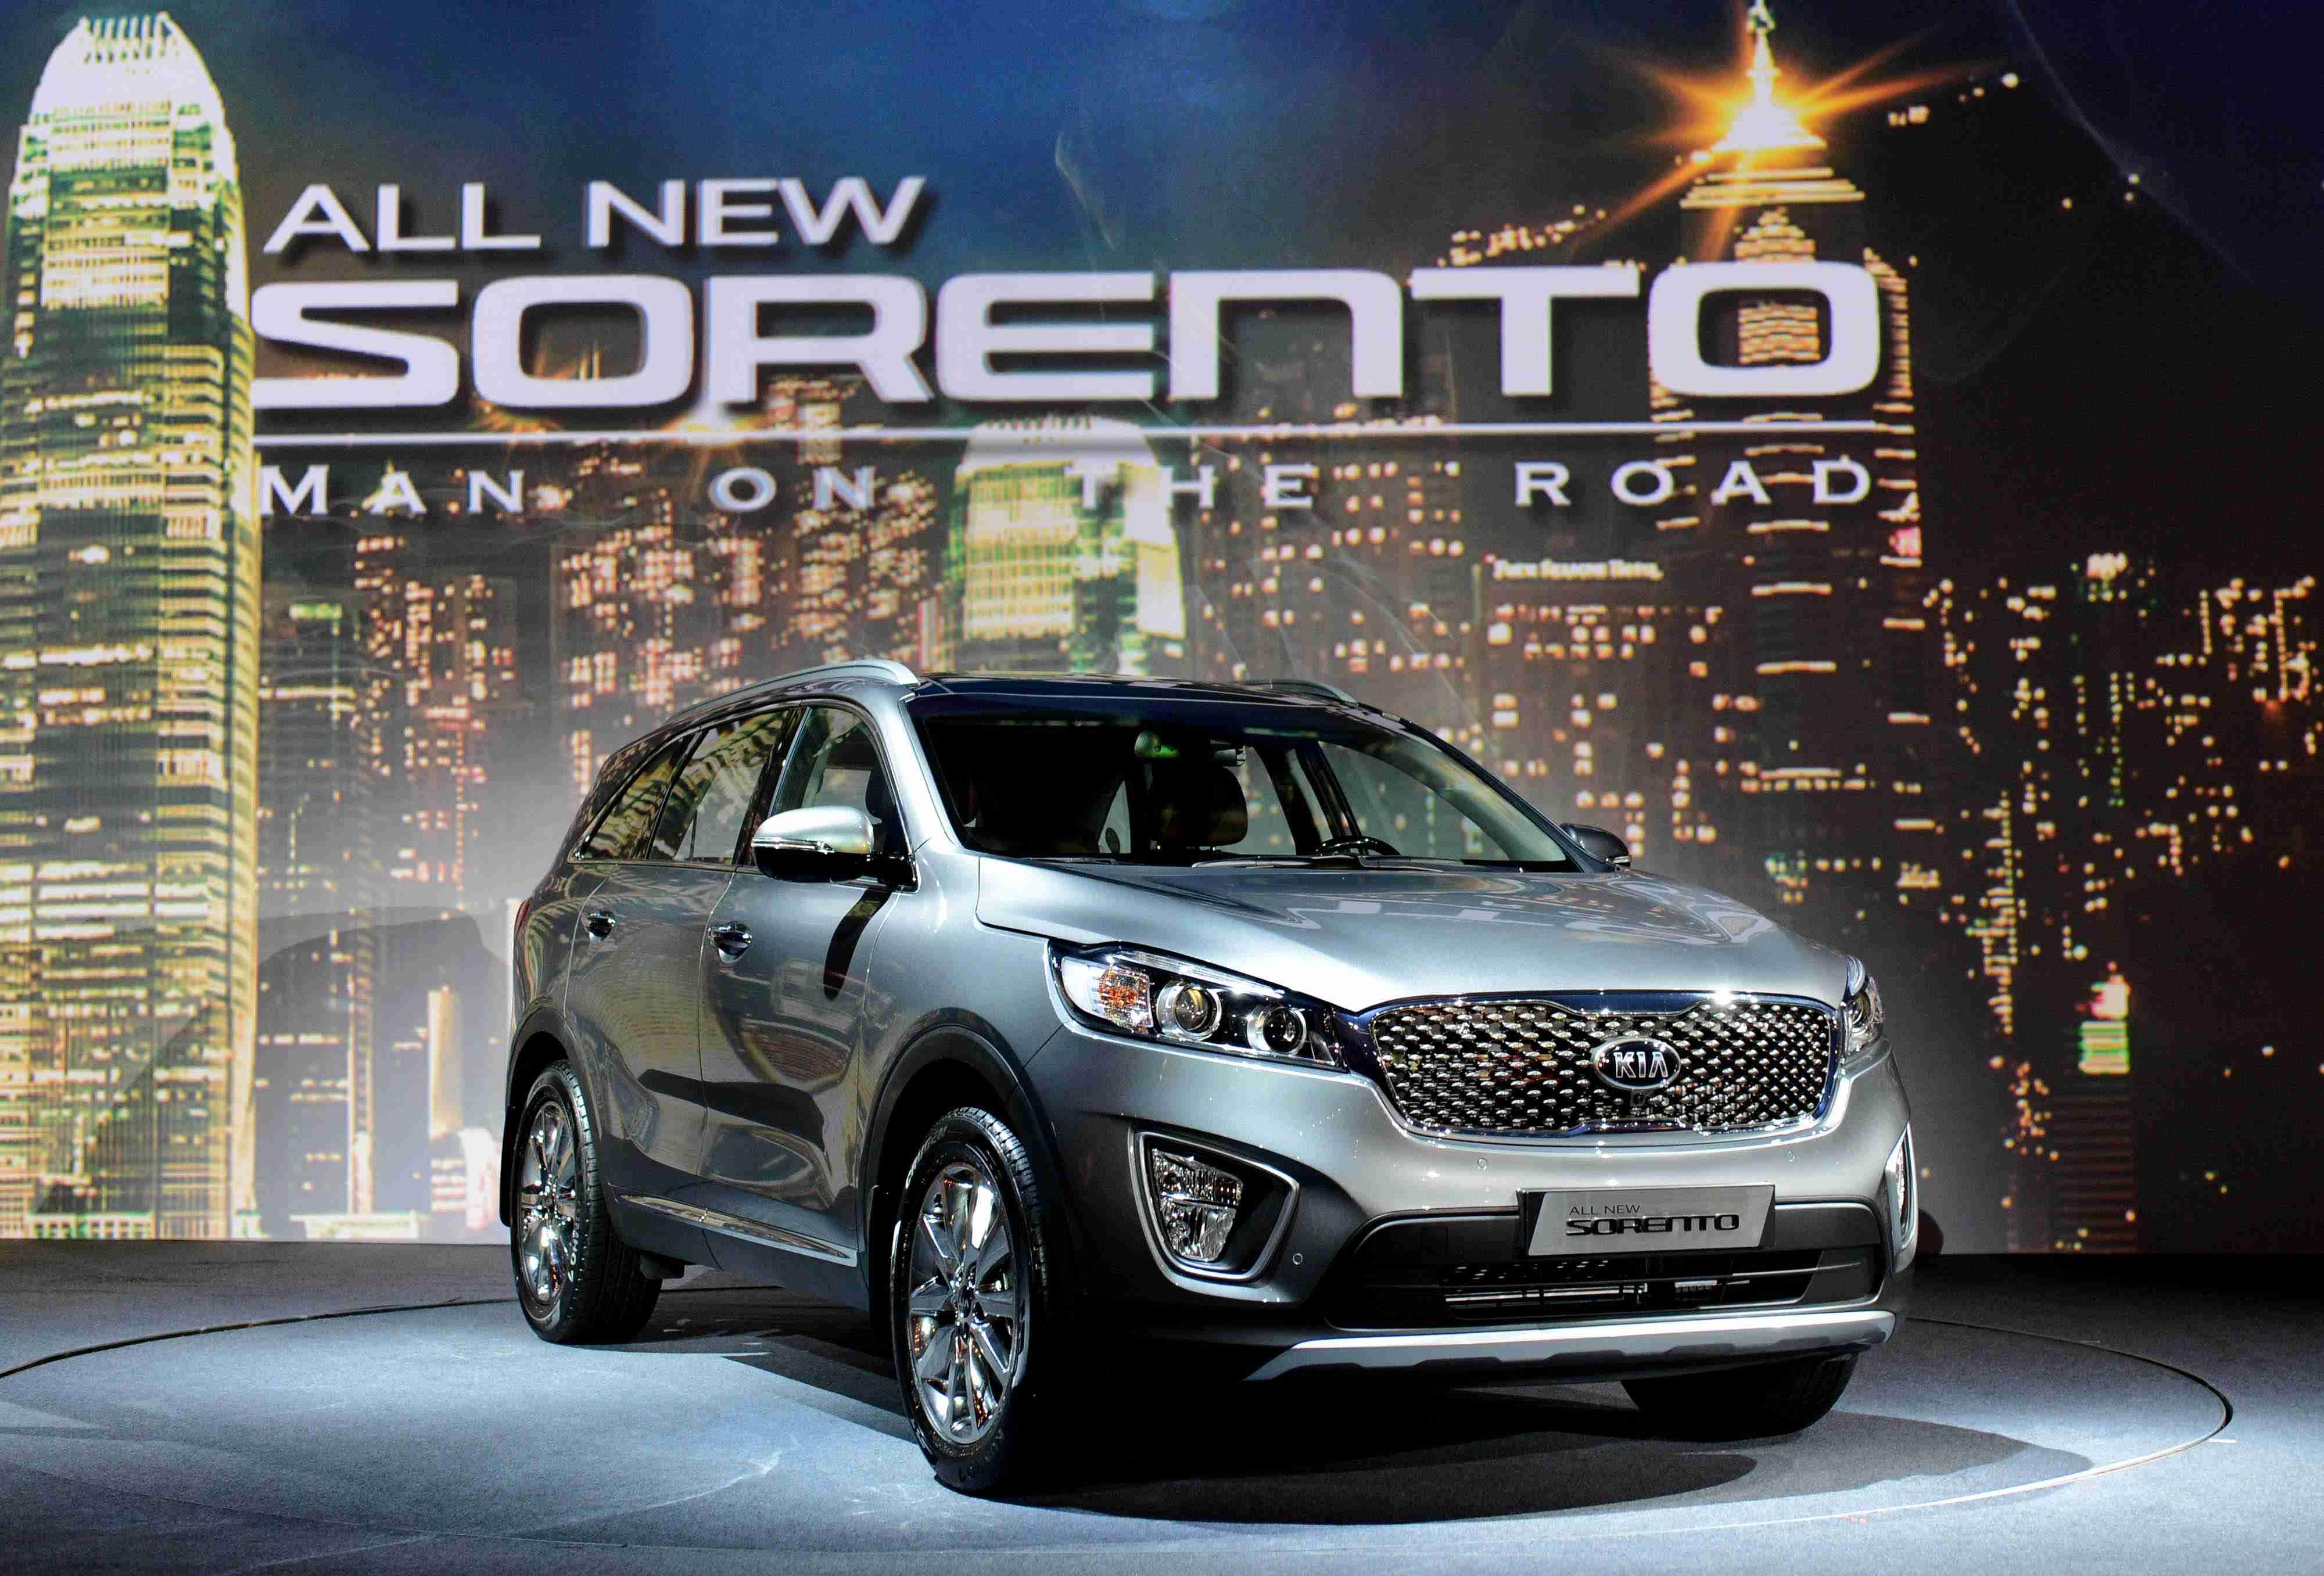 all-new-kia-sorento-launched-in-south-korea-3